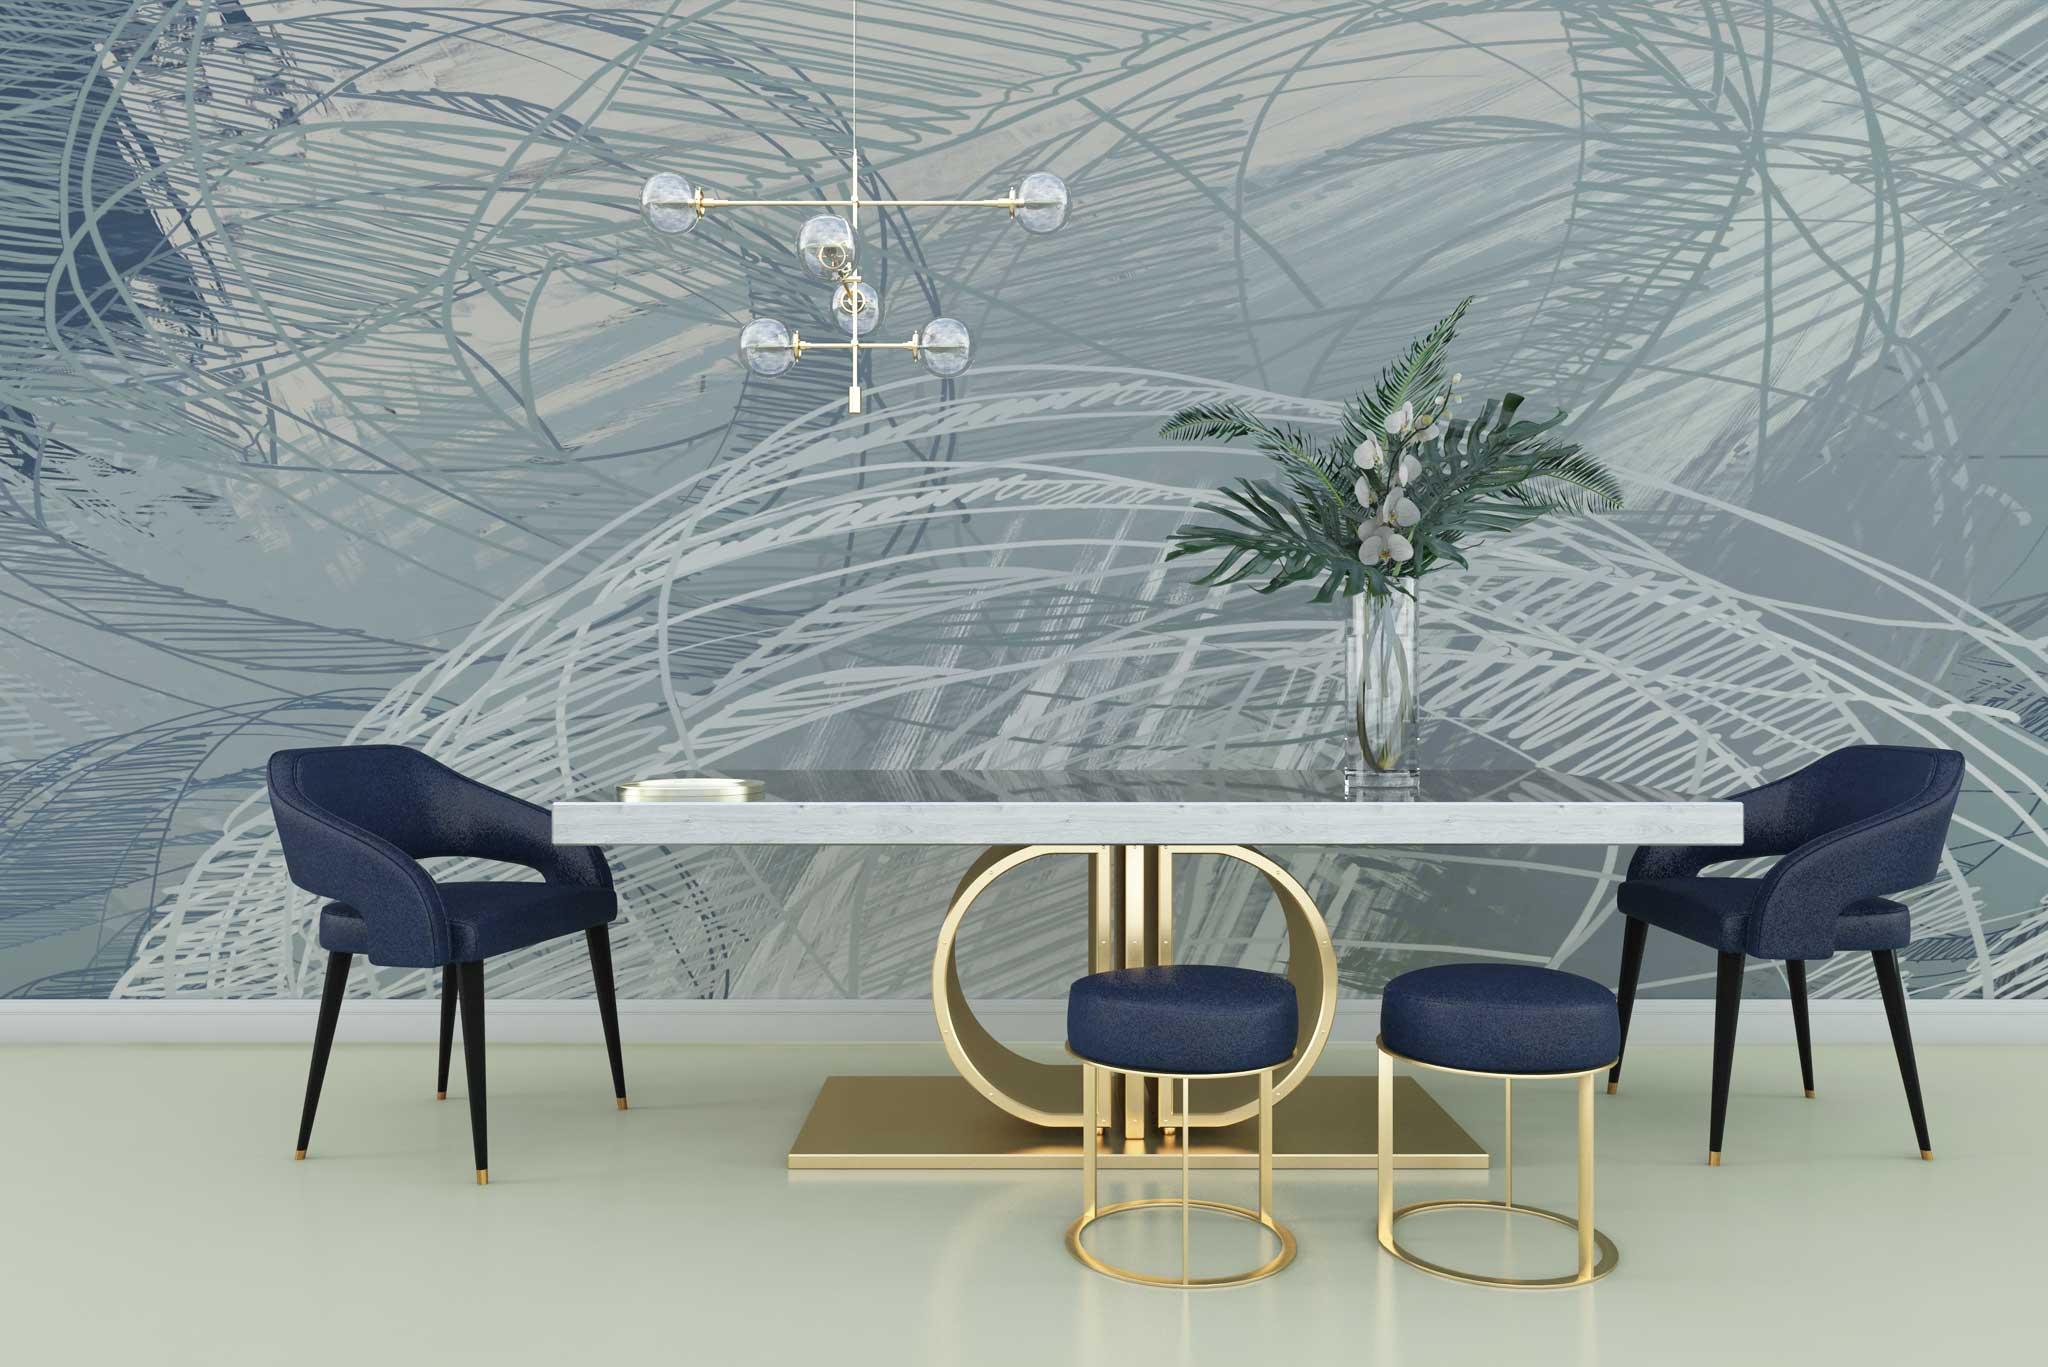 tapet-fototapet-personalizat-comanda-bucuresti-pictura-abstracta-grafic-model-cercuri-gri-argintiu-perete-lux-special